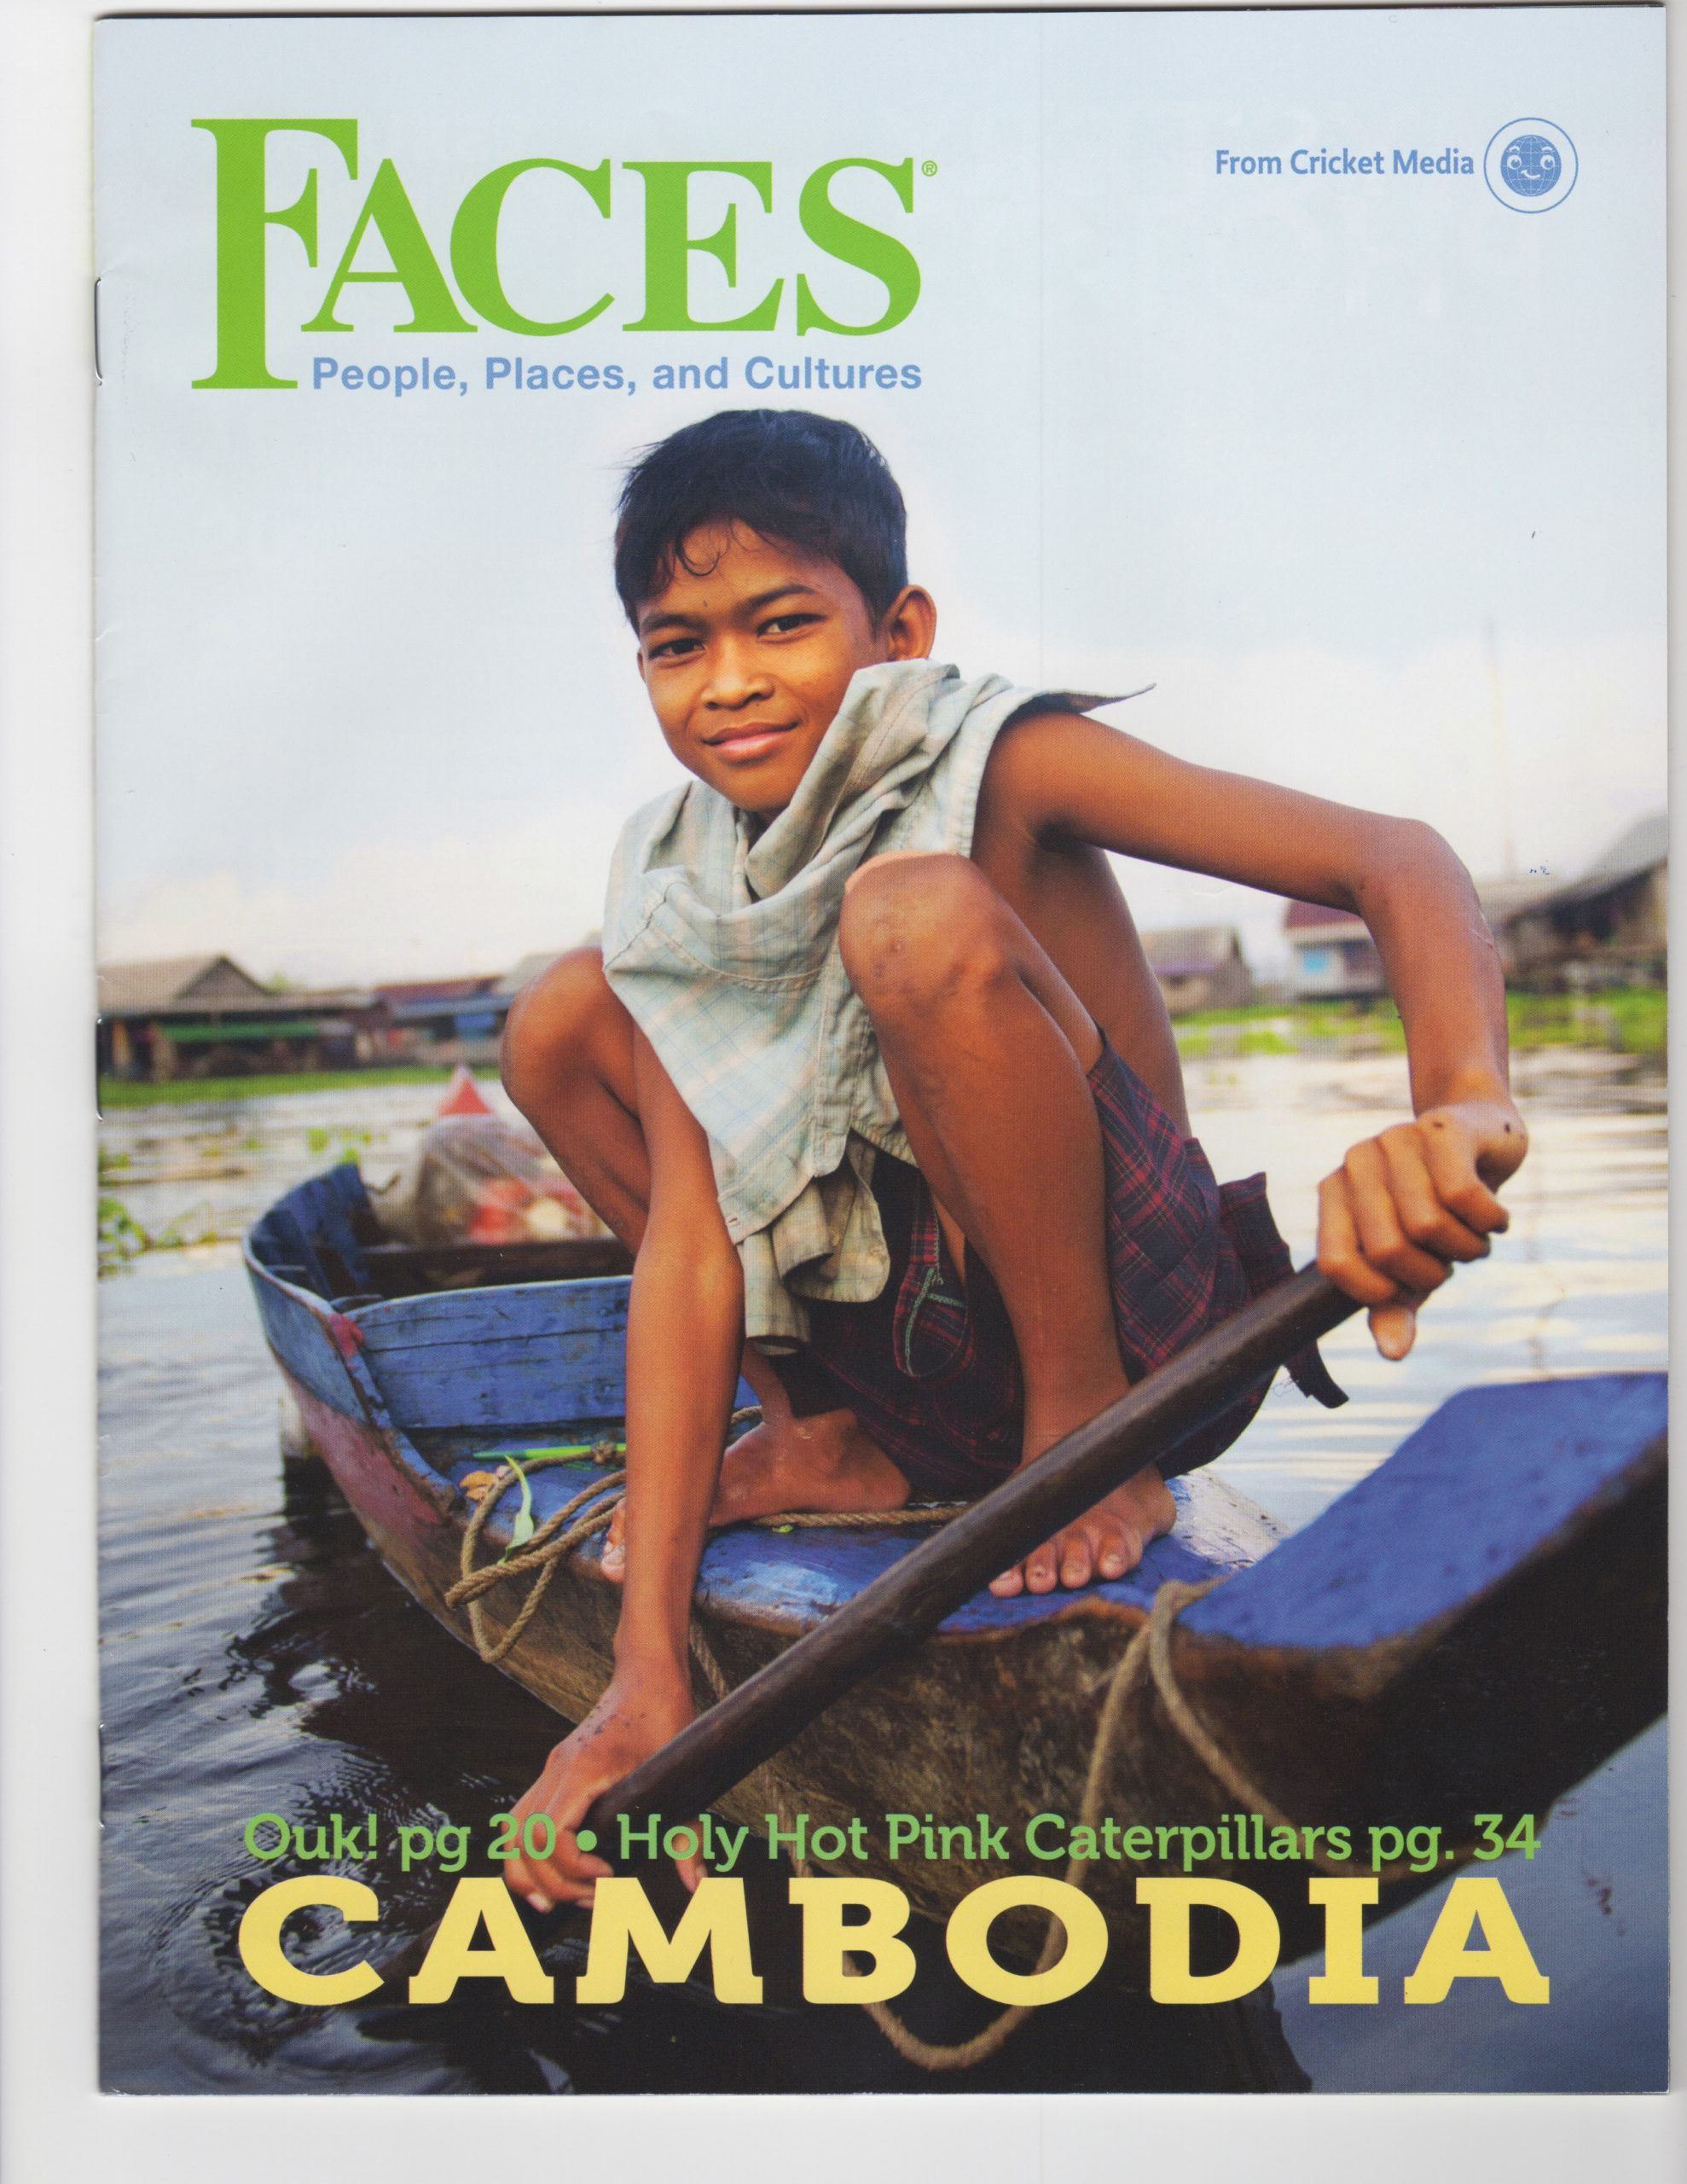 Cambodia, FACES Magazine, September 2016